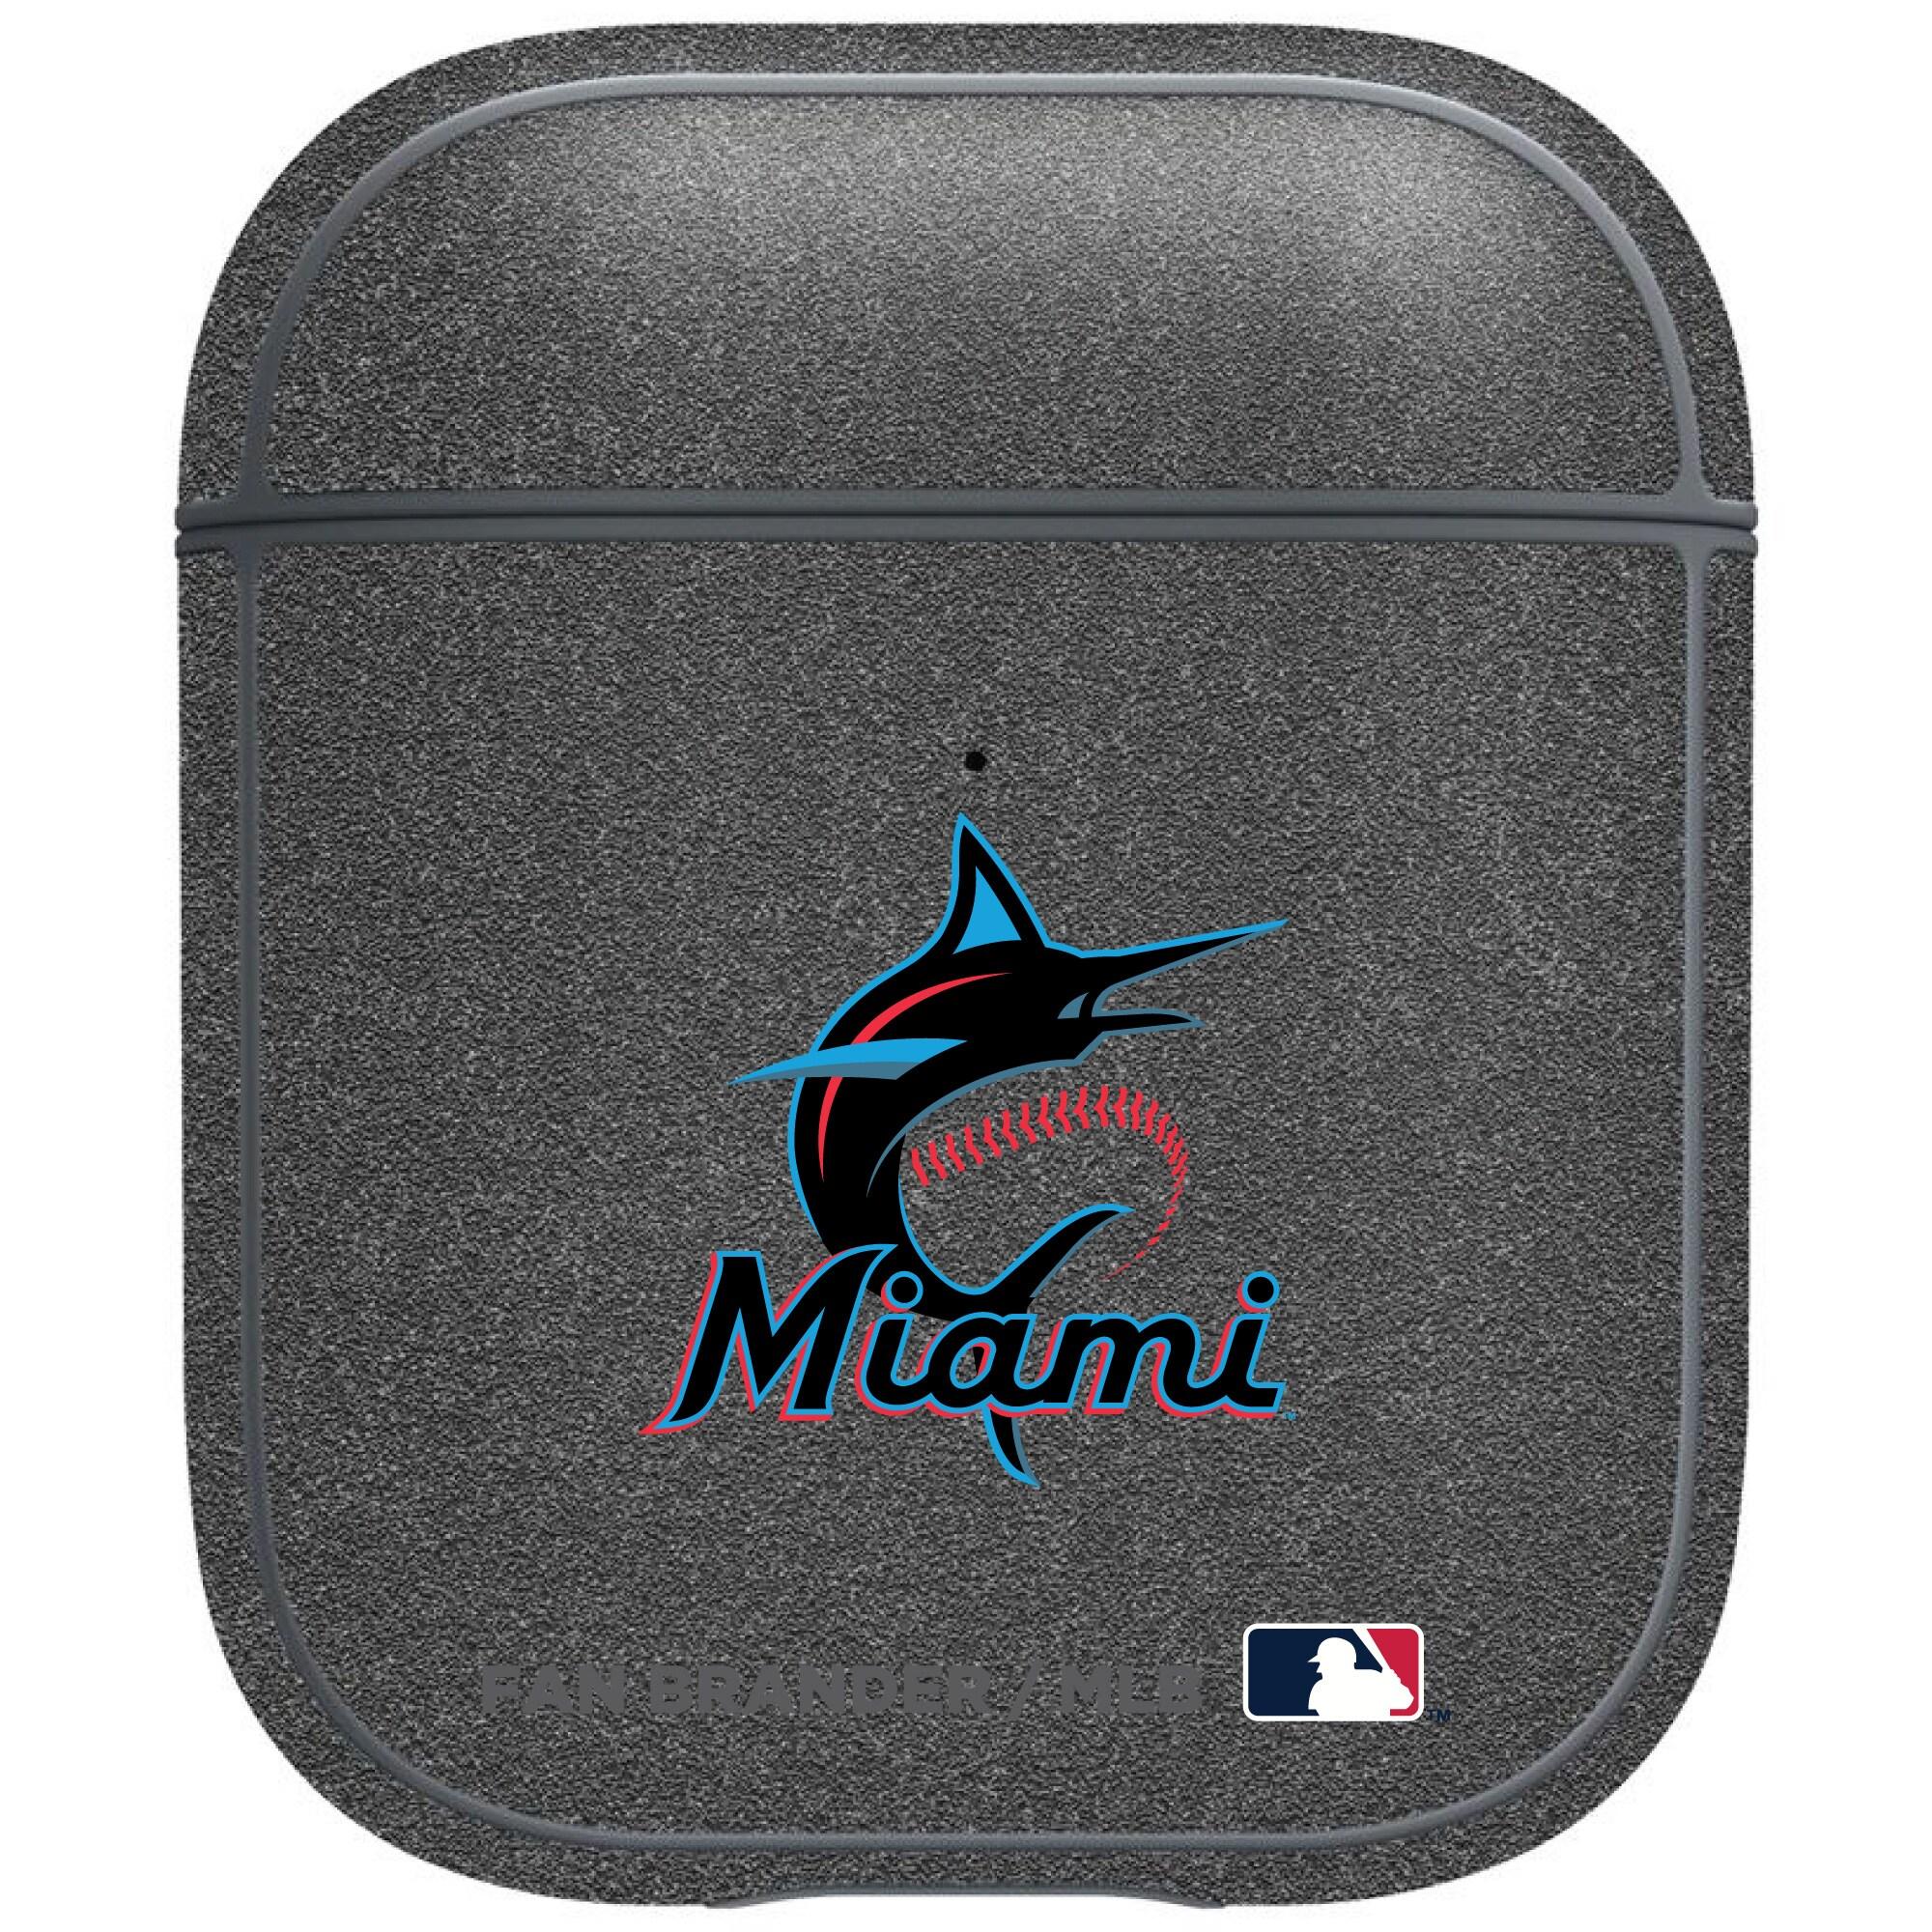 Miami Marlins Air Pods Metallic Case - Gray